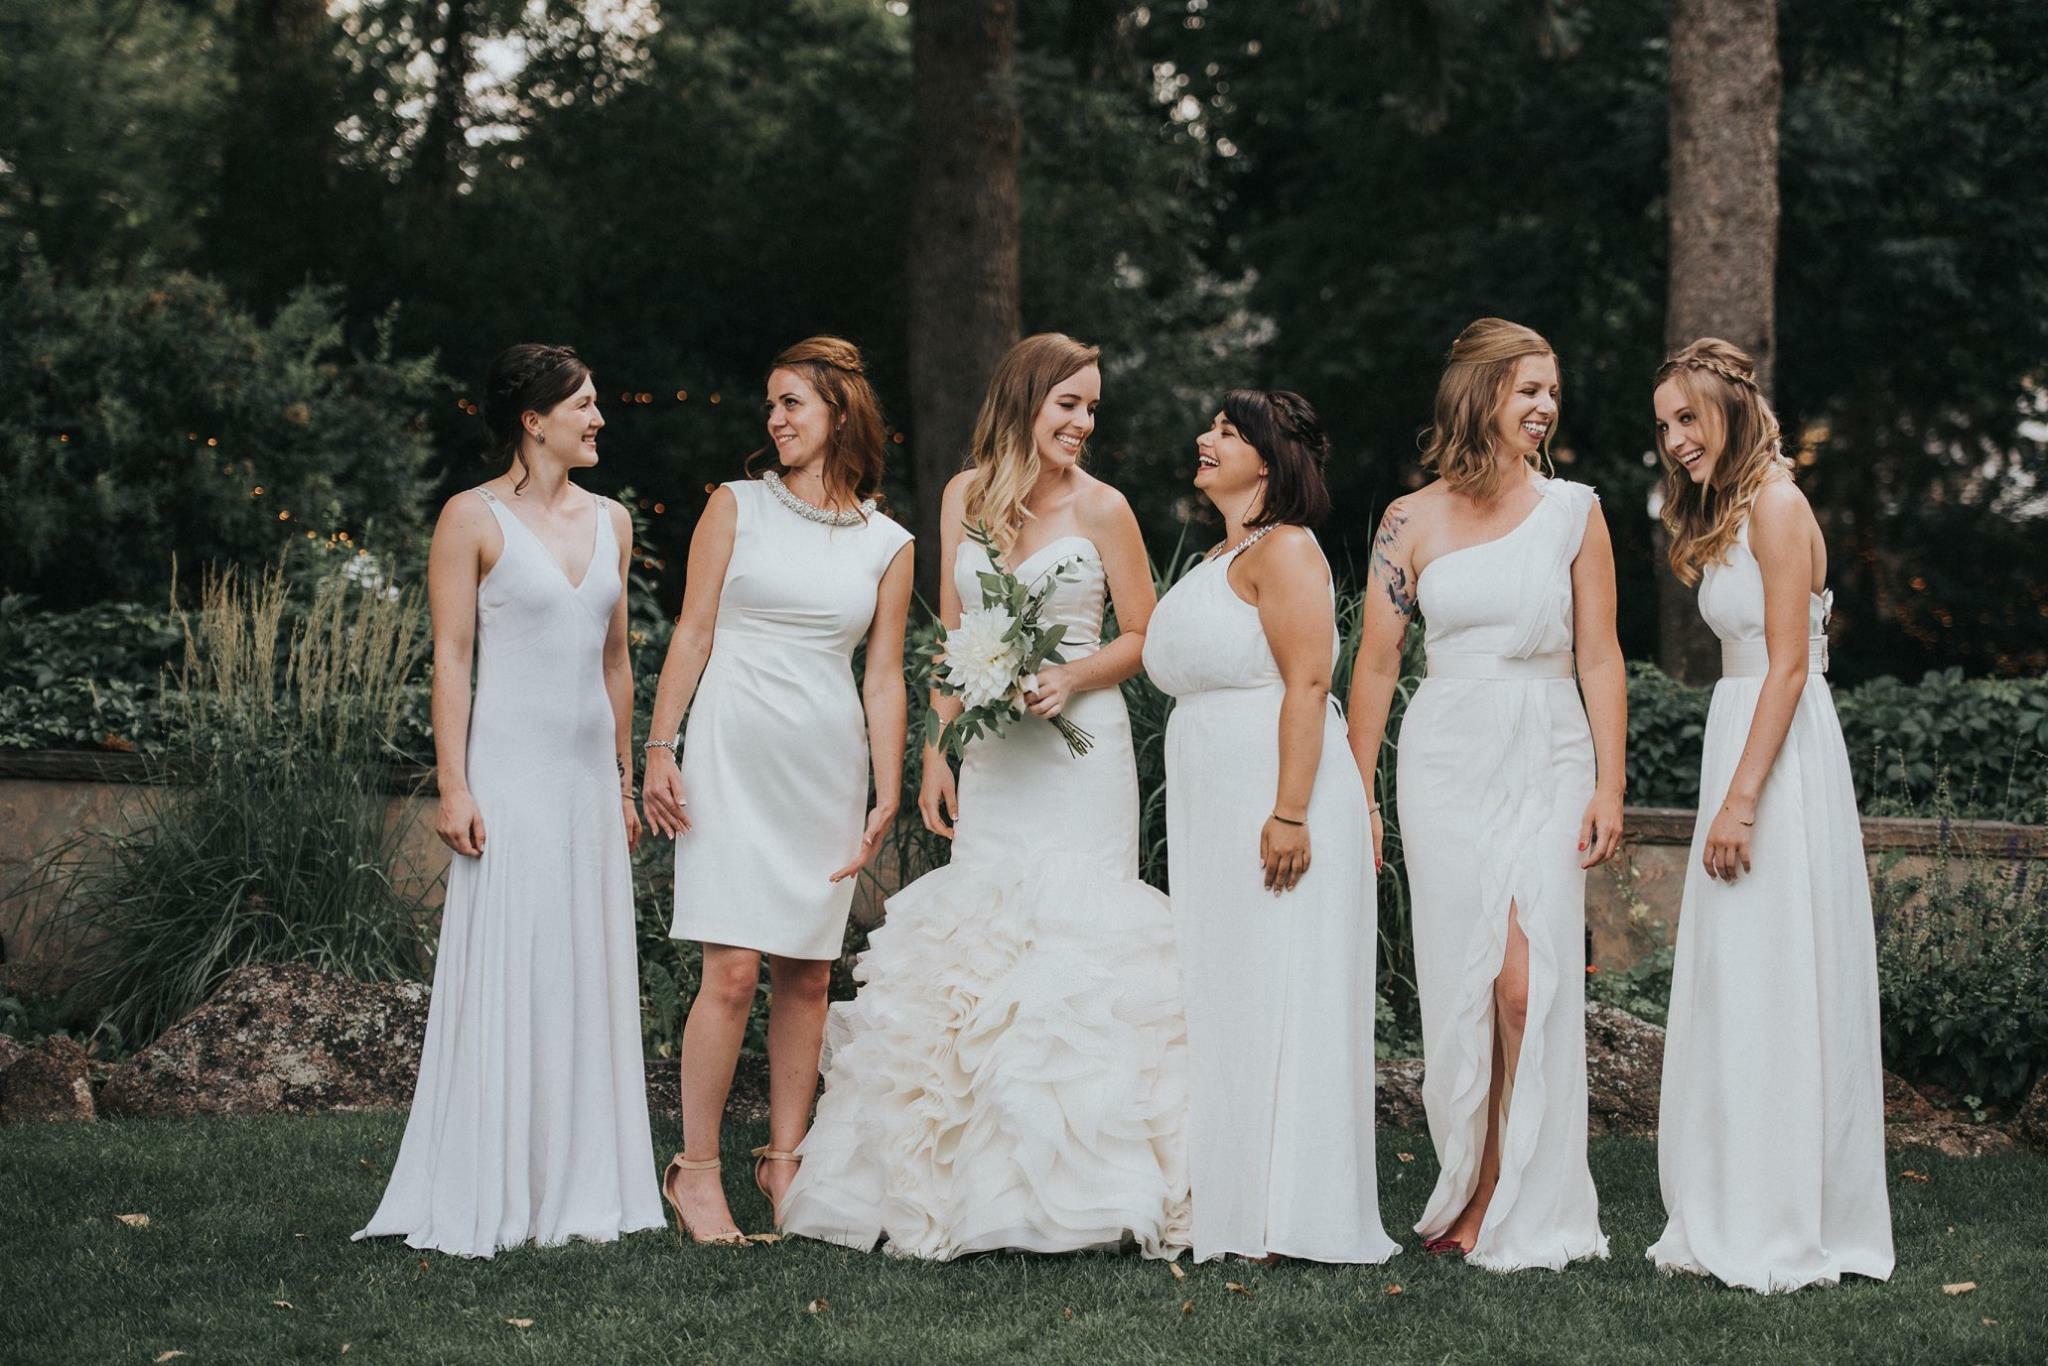 Denver-wedding-hairstylist-bridal-party-wedding-updos